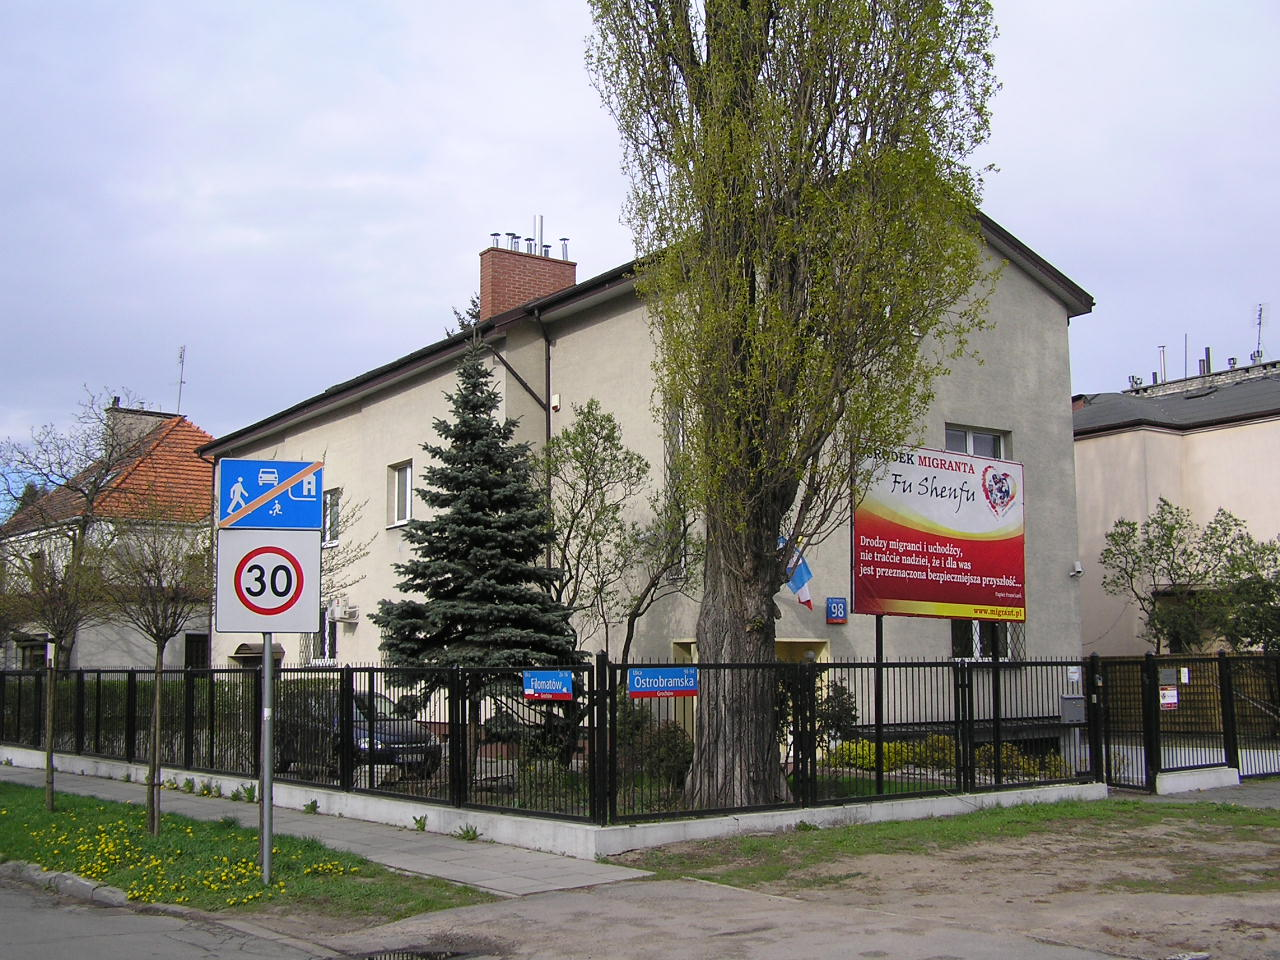 Ostrobramska 98